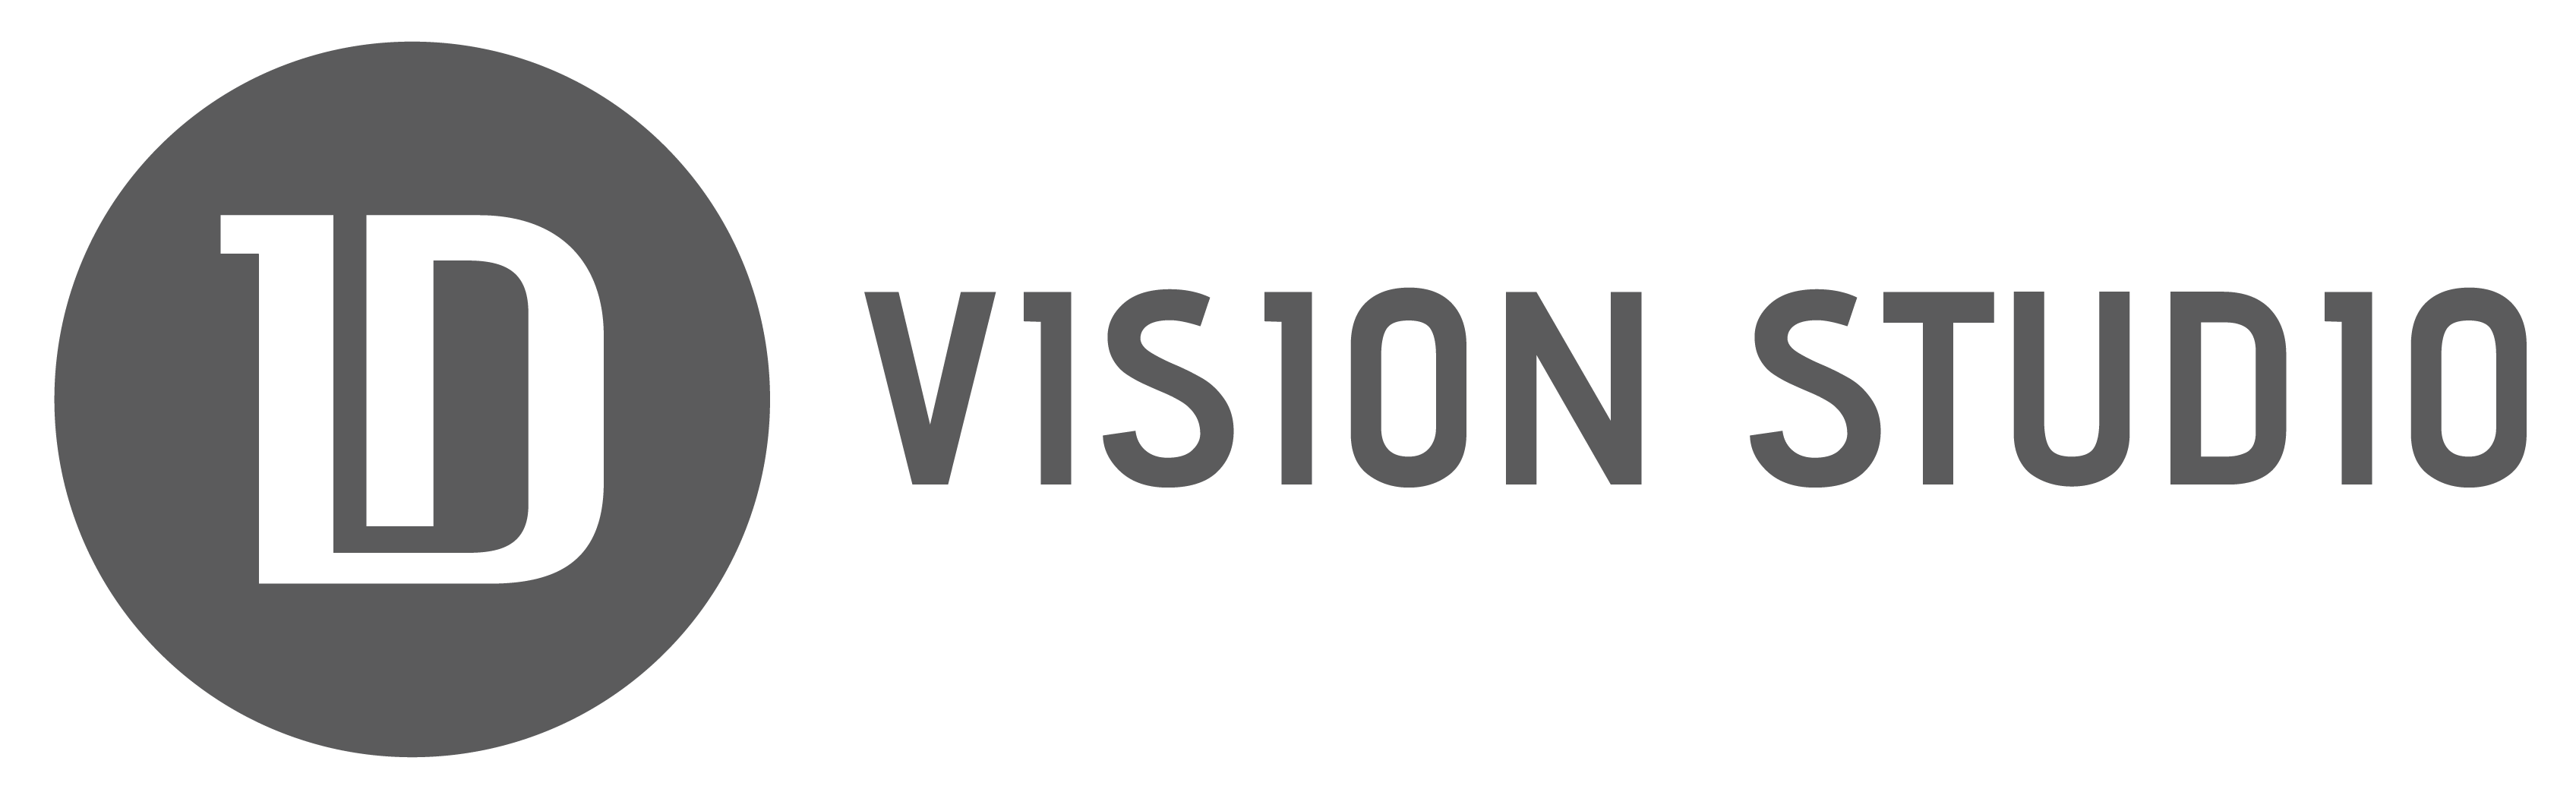 ID Vision Studio